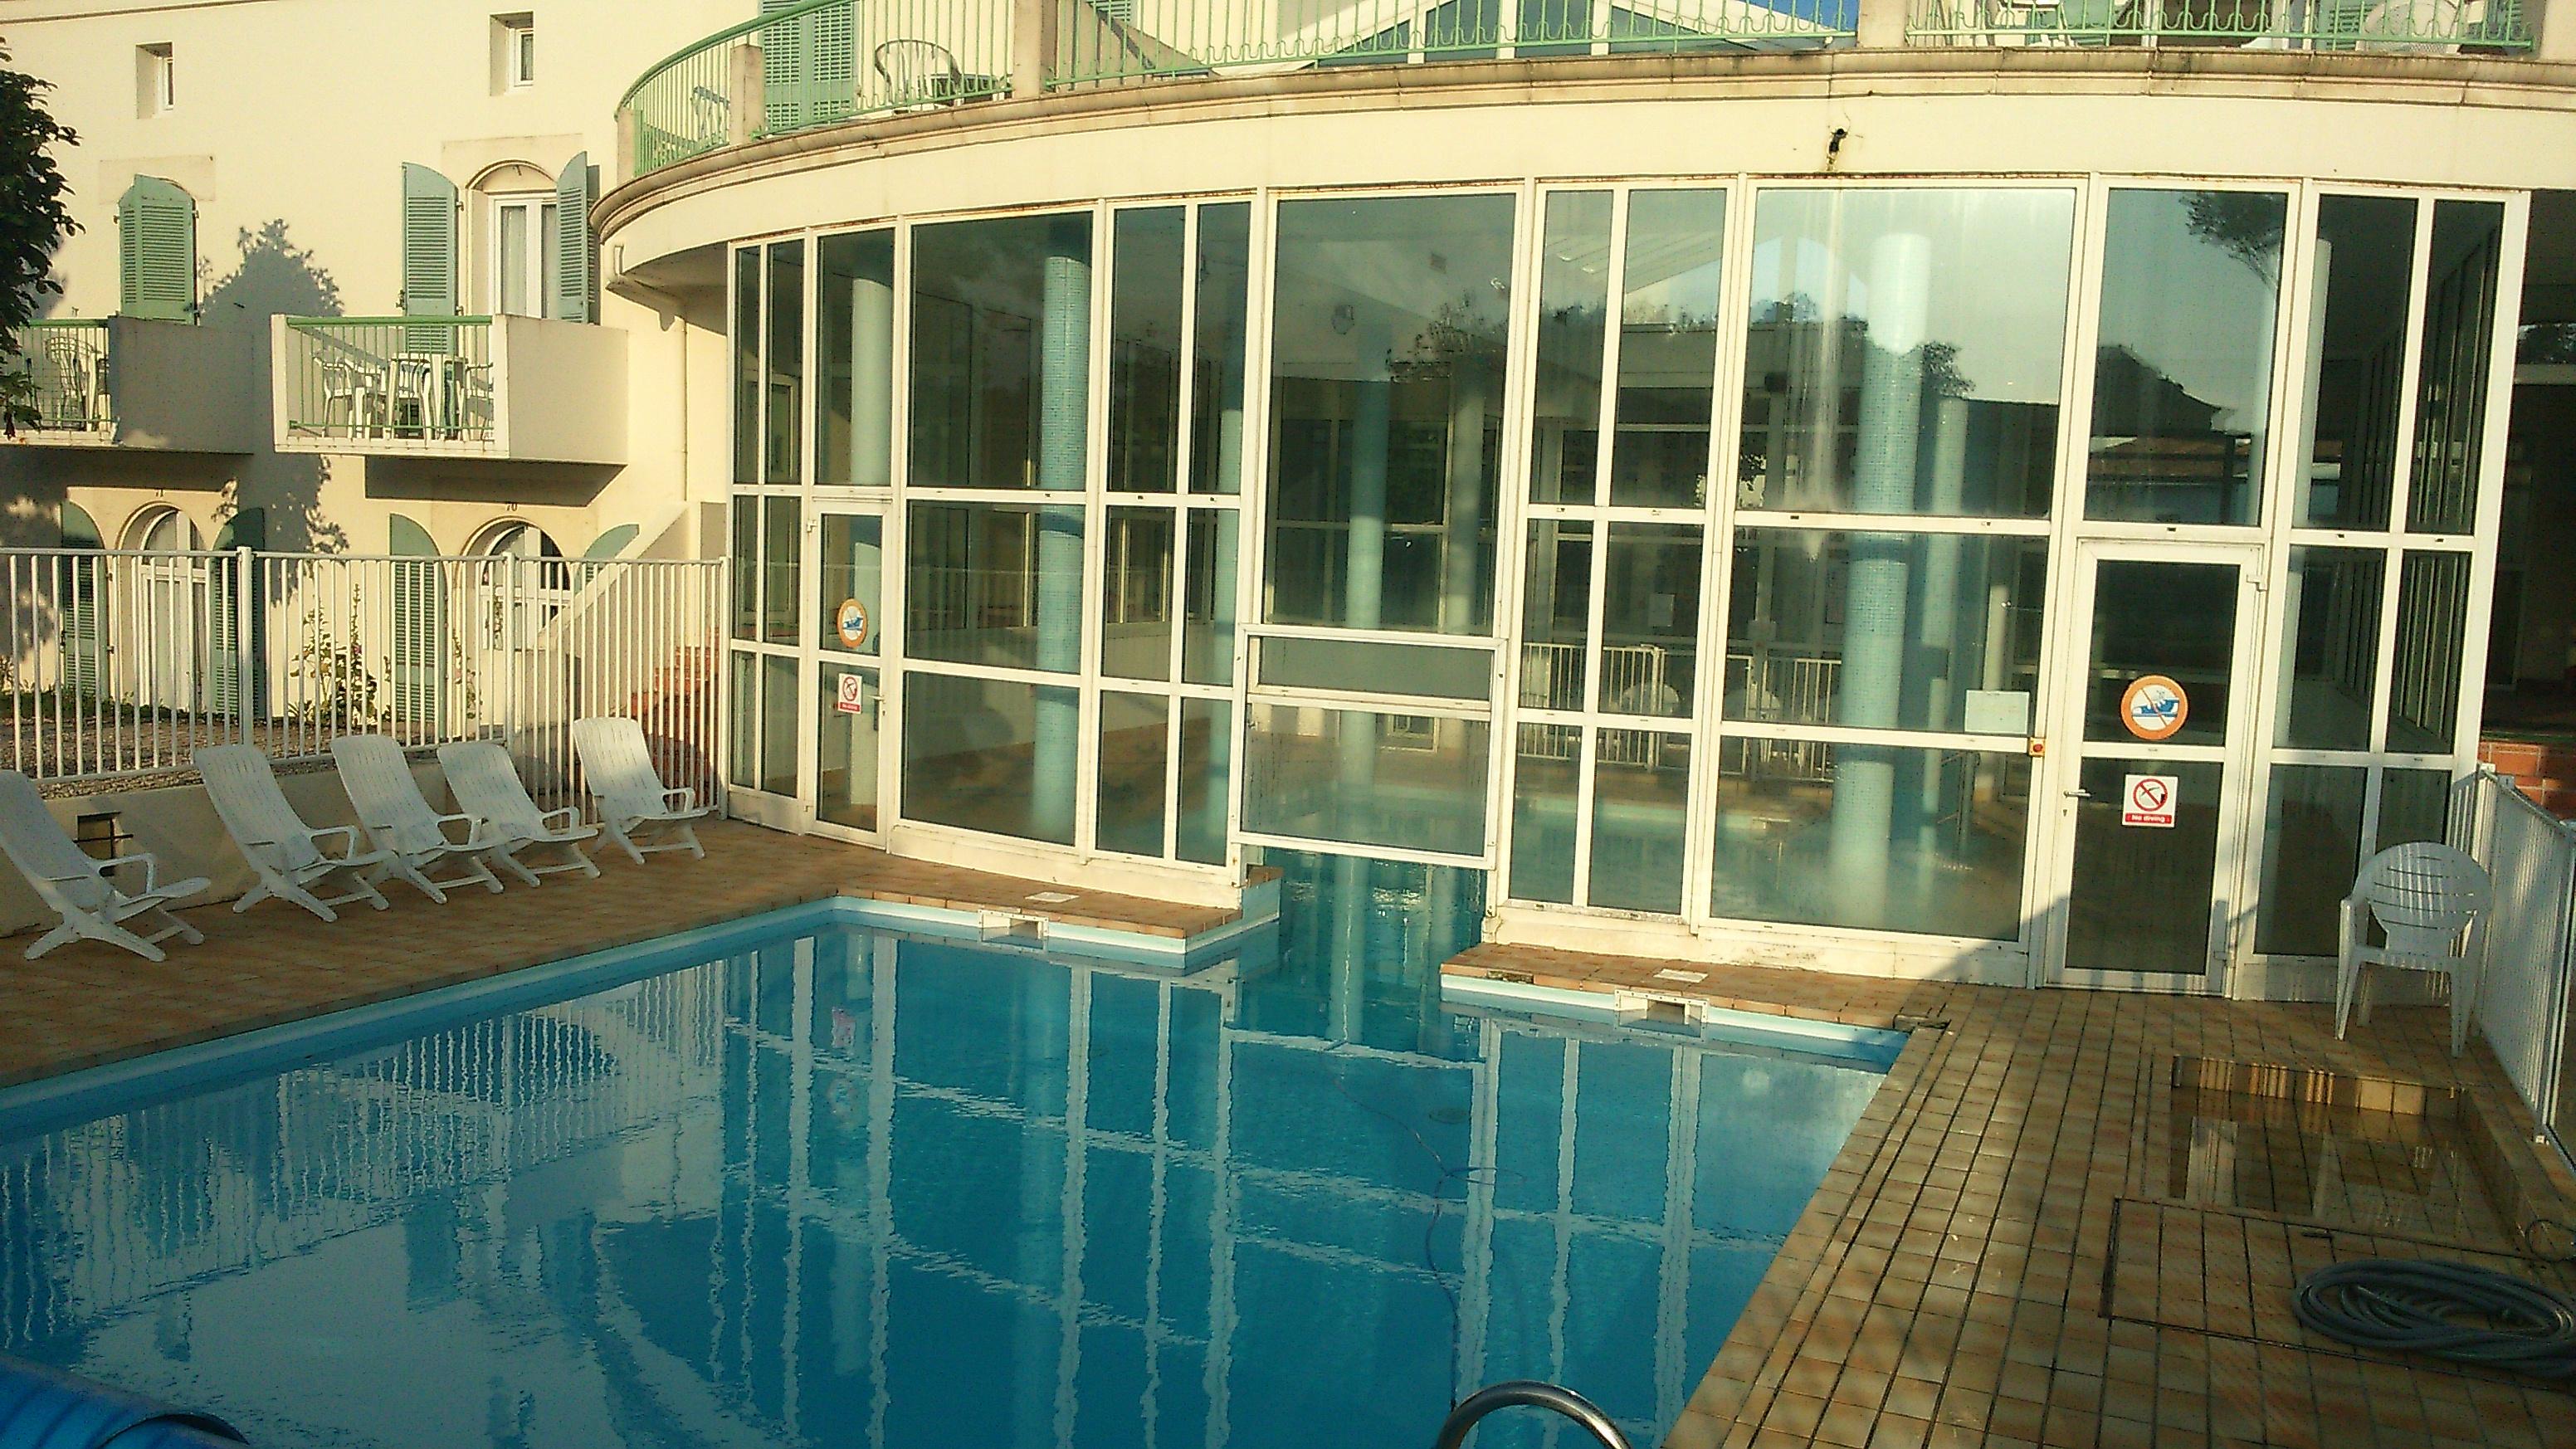 location ile de r saint martin de r f2 avec piscine. Black Bedroom Furniture Sets. Home Design Ideas